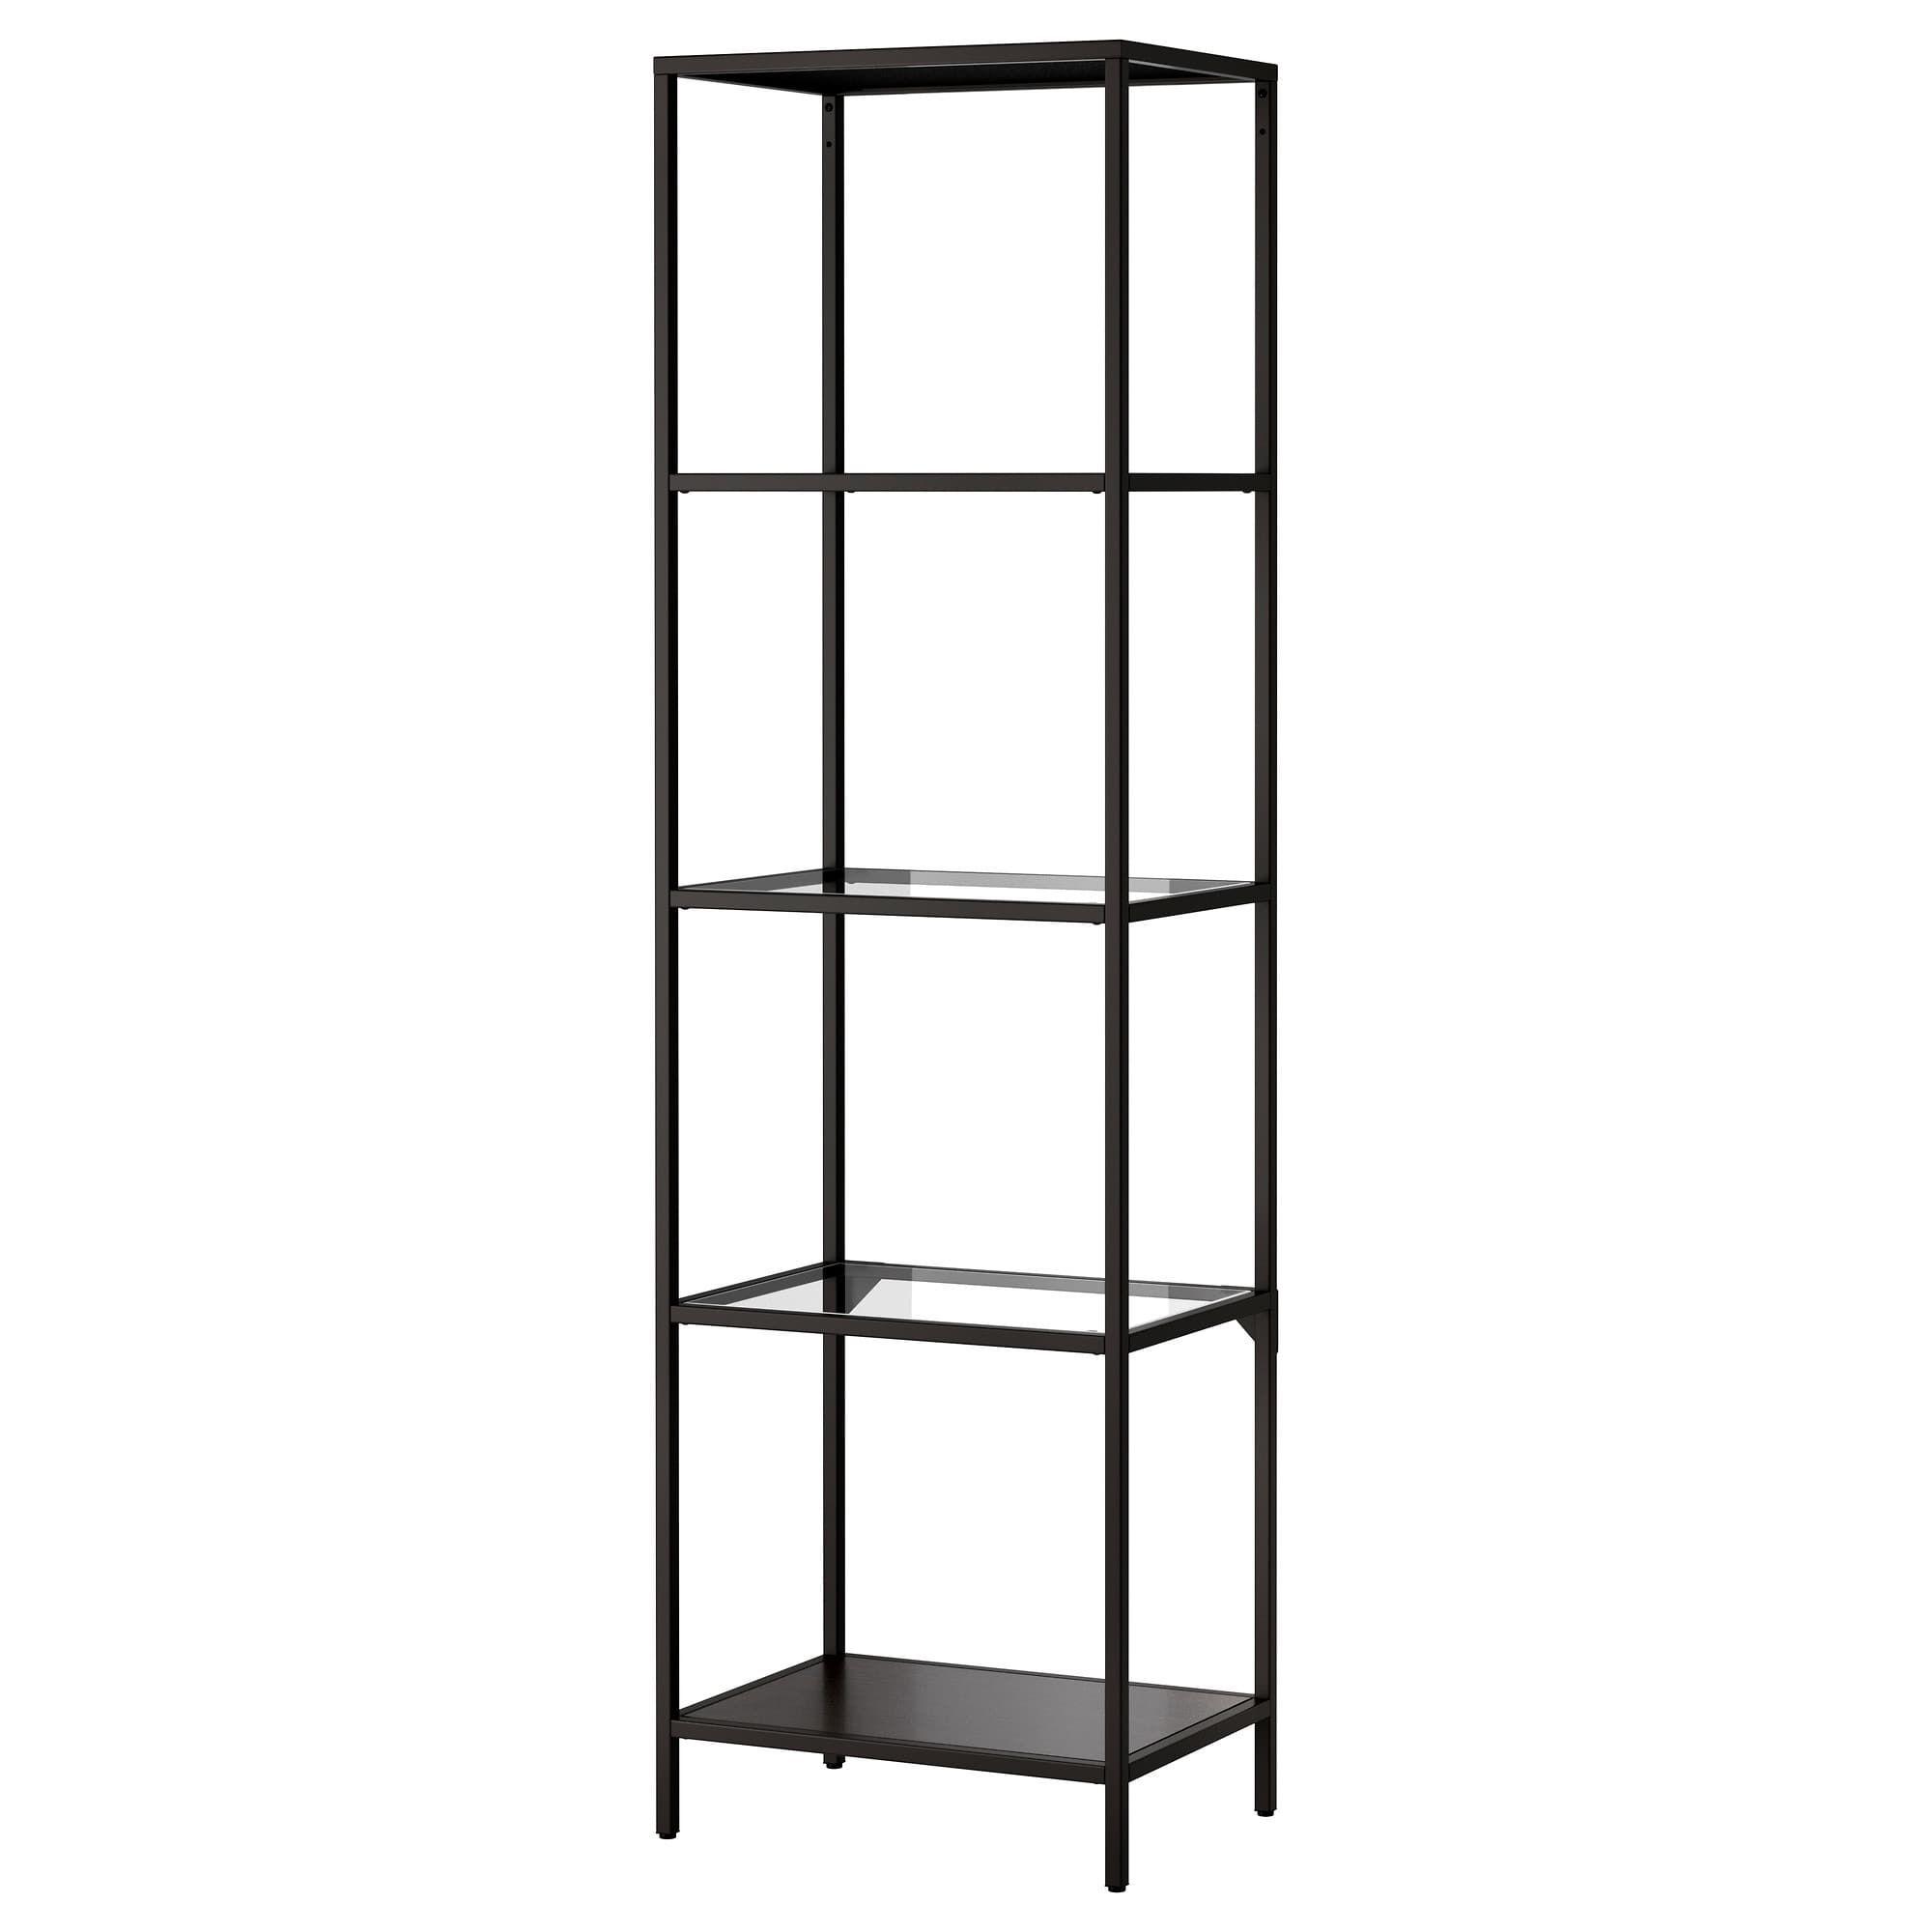 Ikea Vittsjo Shelf Unit Black Brown Glass